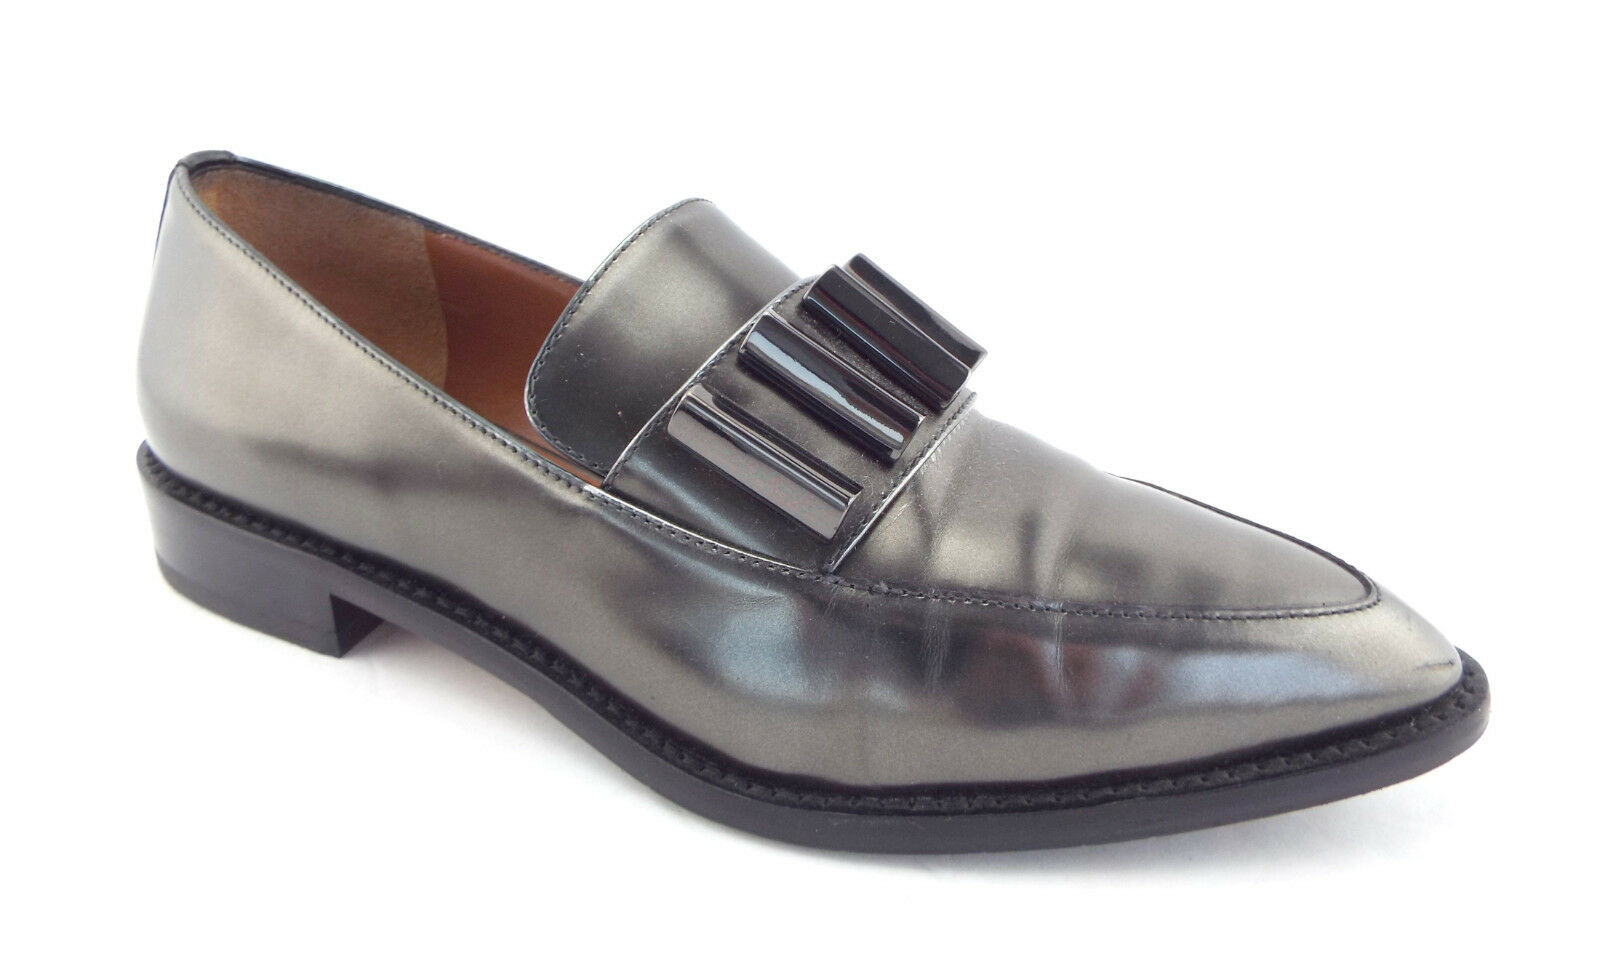 AQUATALIA AQUATALIA AQUATALIA Size 6 GWENDOLYN Pewter Metallic Loafers Flats Shoes 117ffc